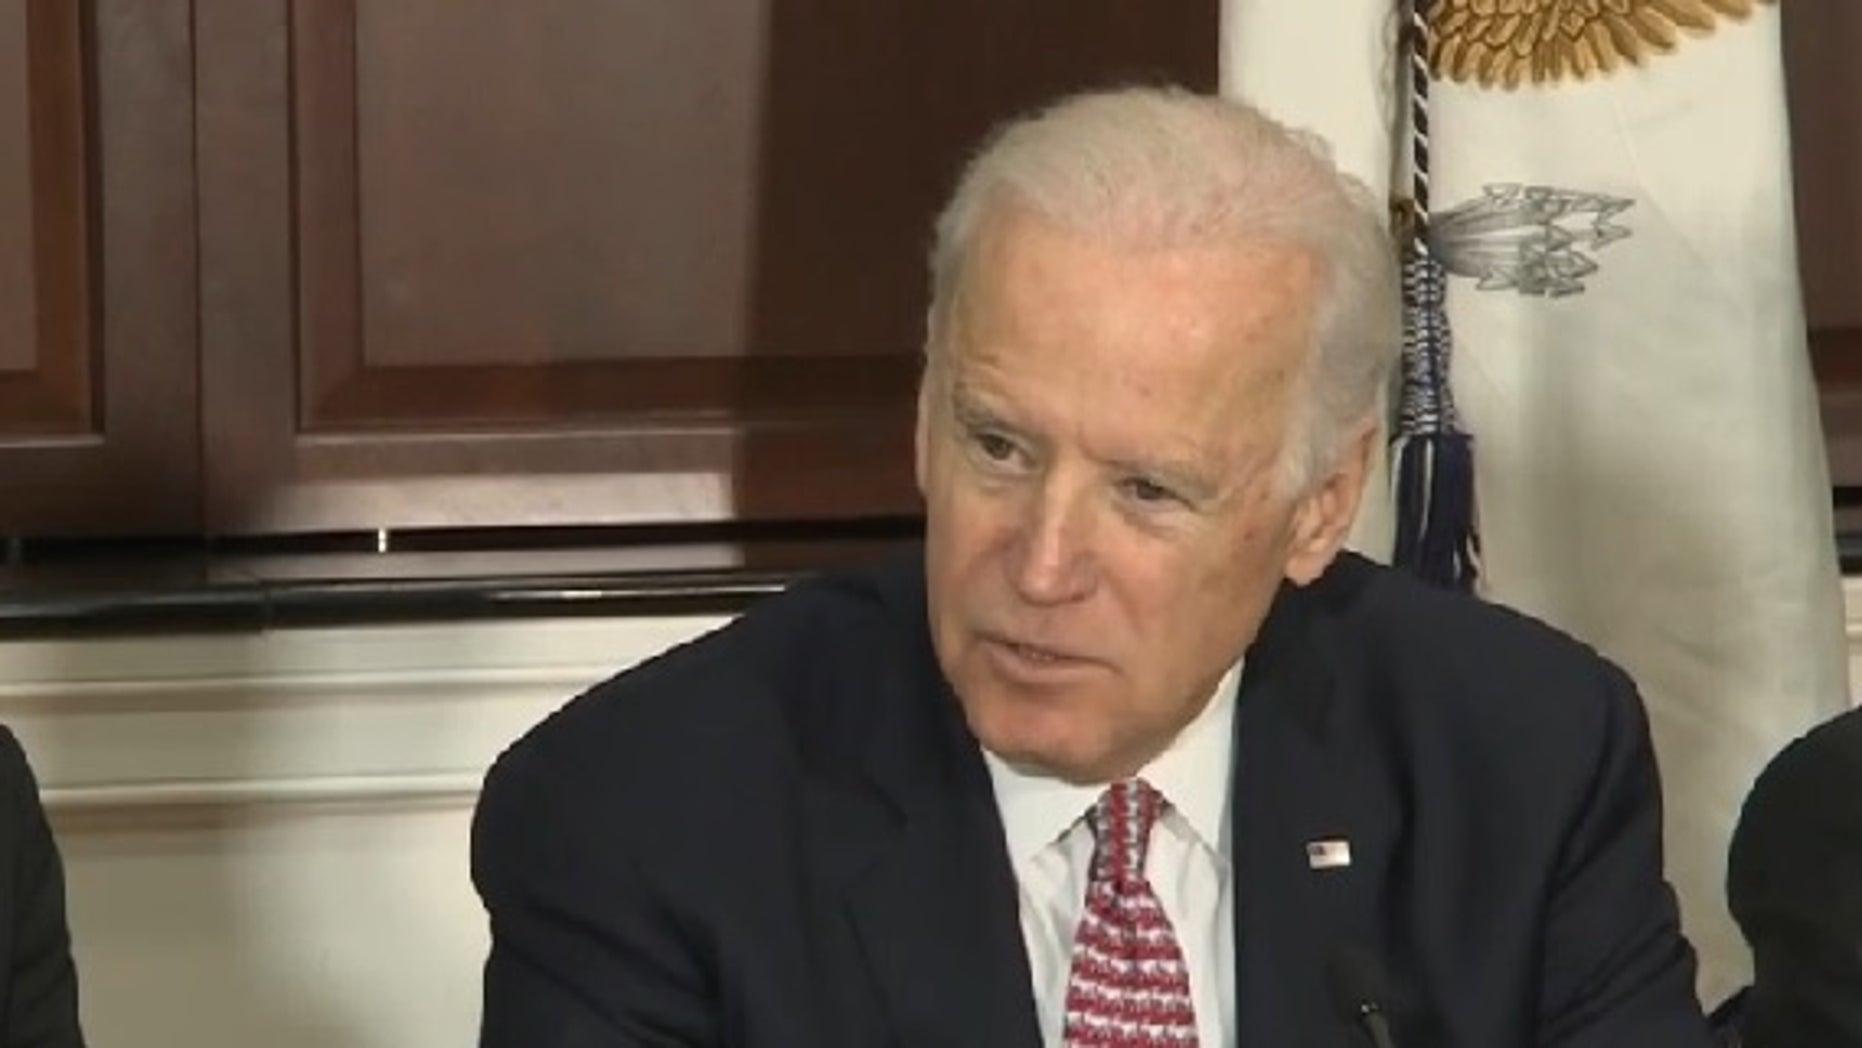 Joe Biden. Screen capture from C-SPAN.